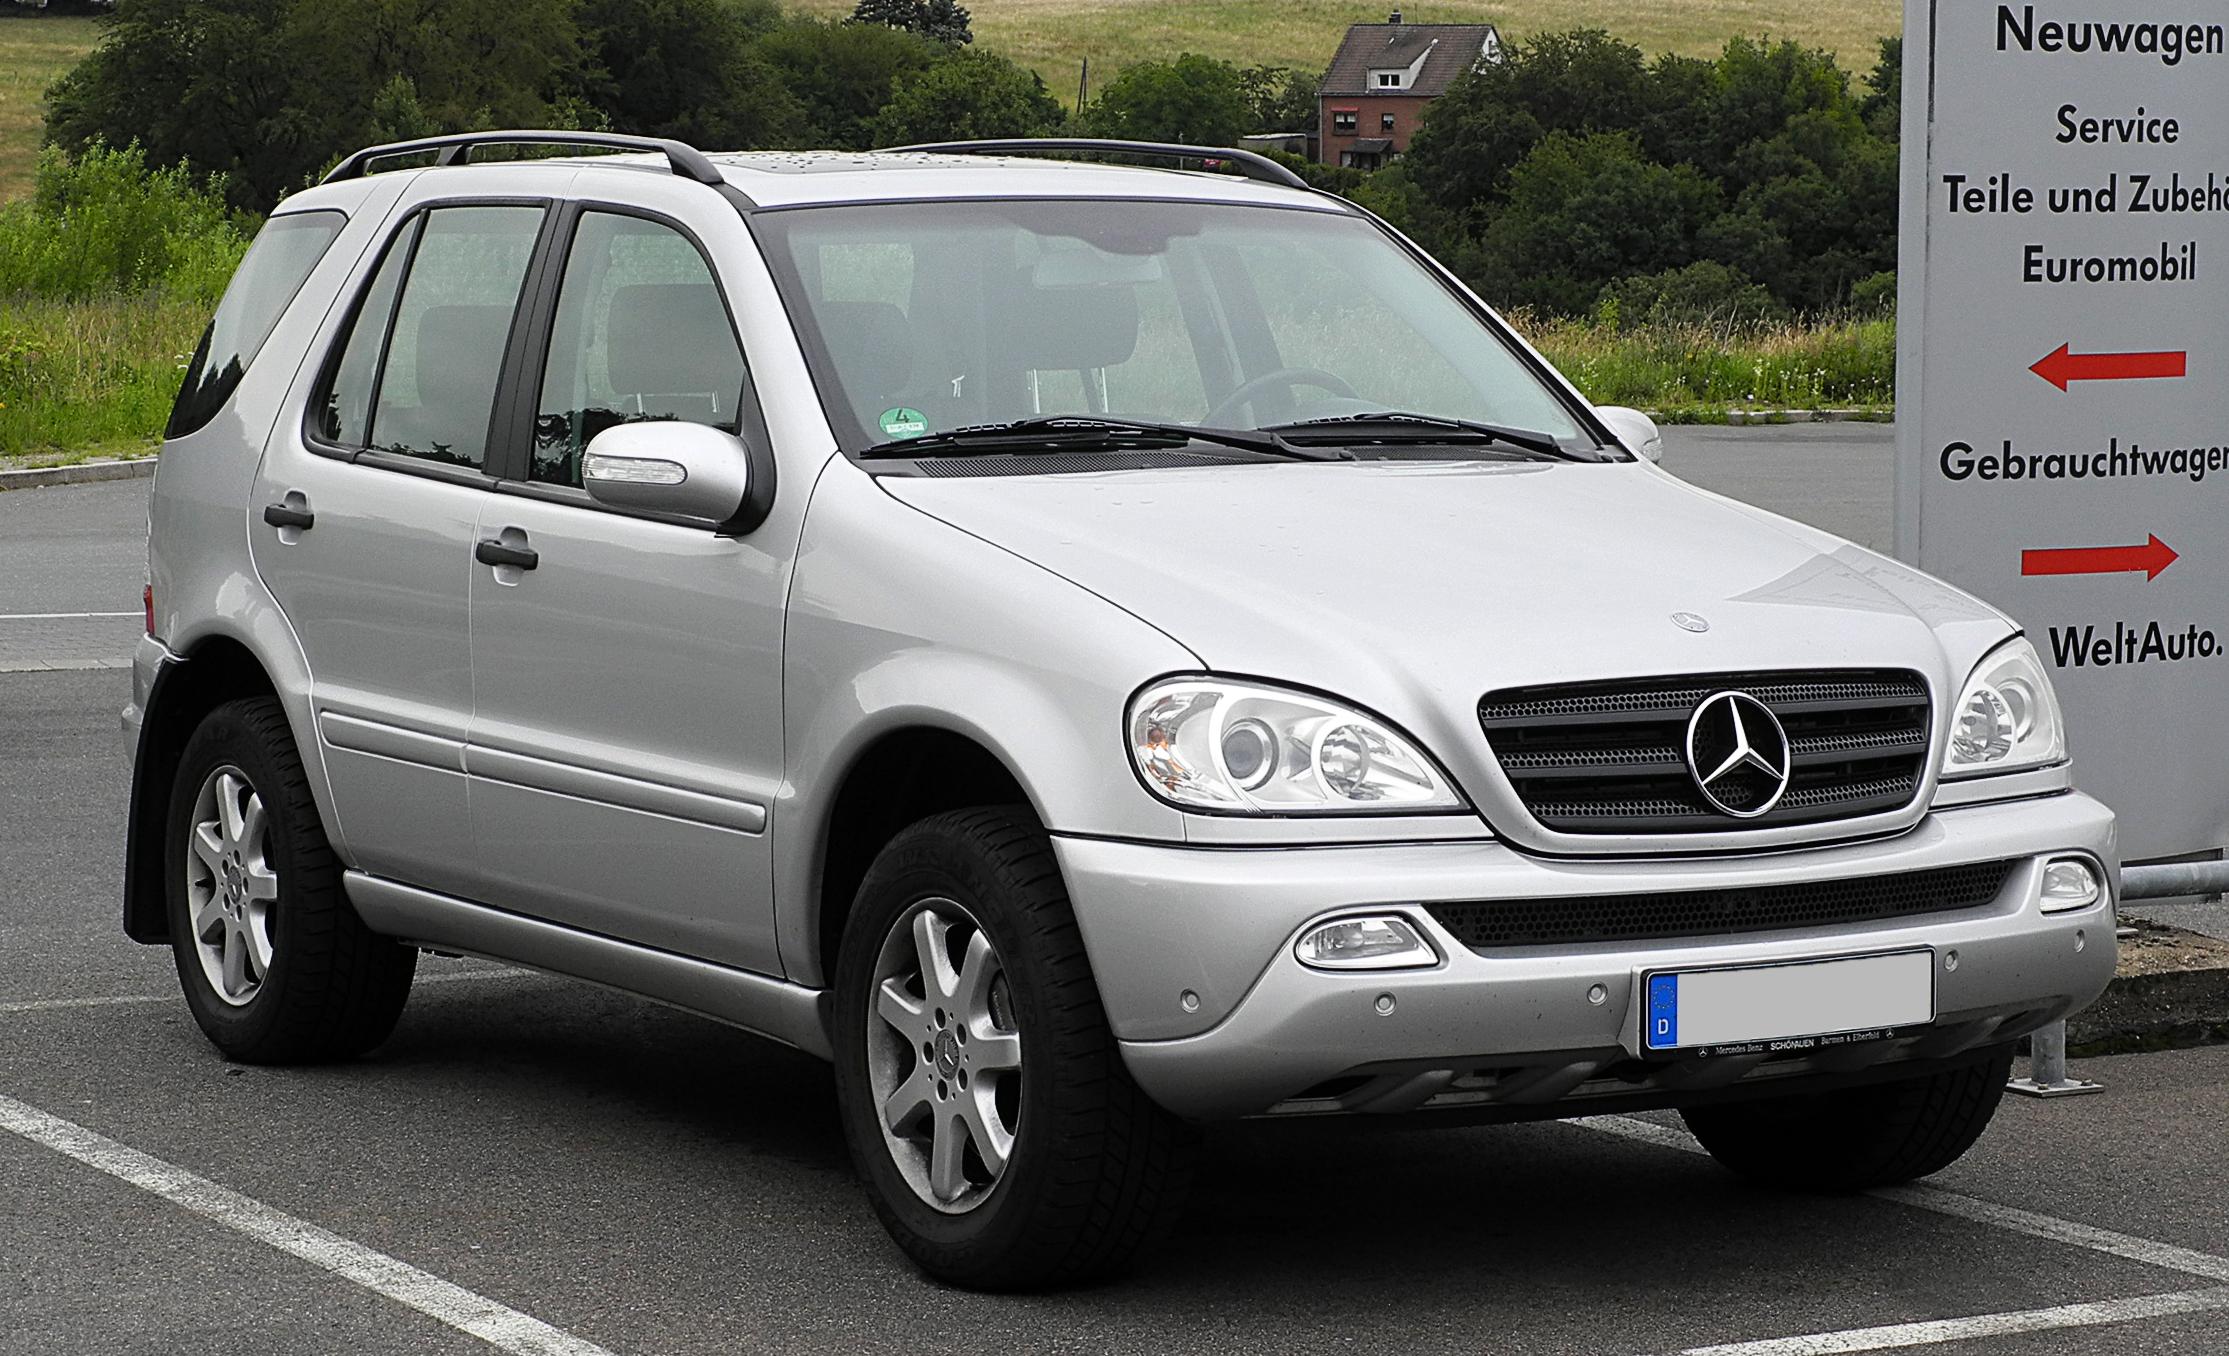 Mercedes-Benz M-klasse AMG I (W163) Restyling 2001 - 2005 SUV 5 door #5